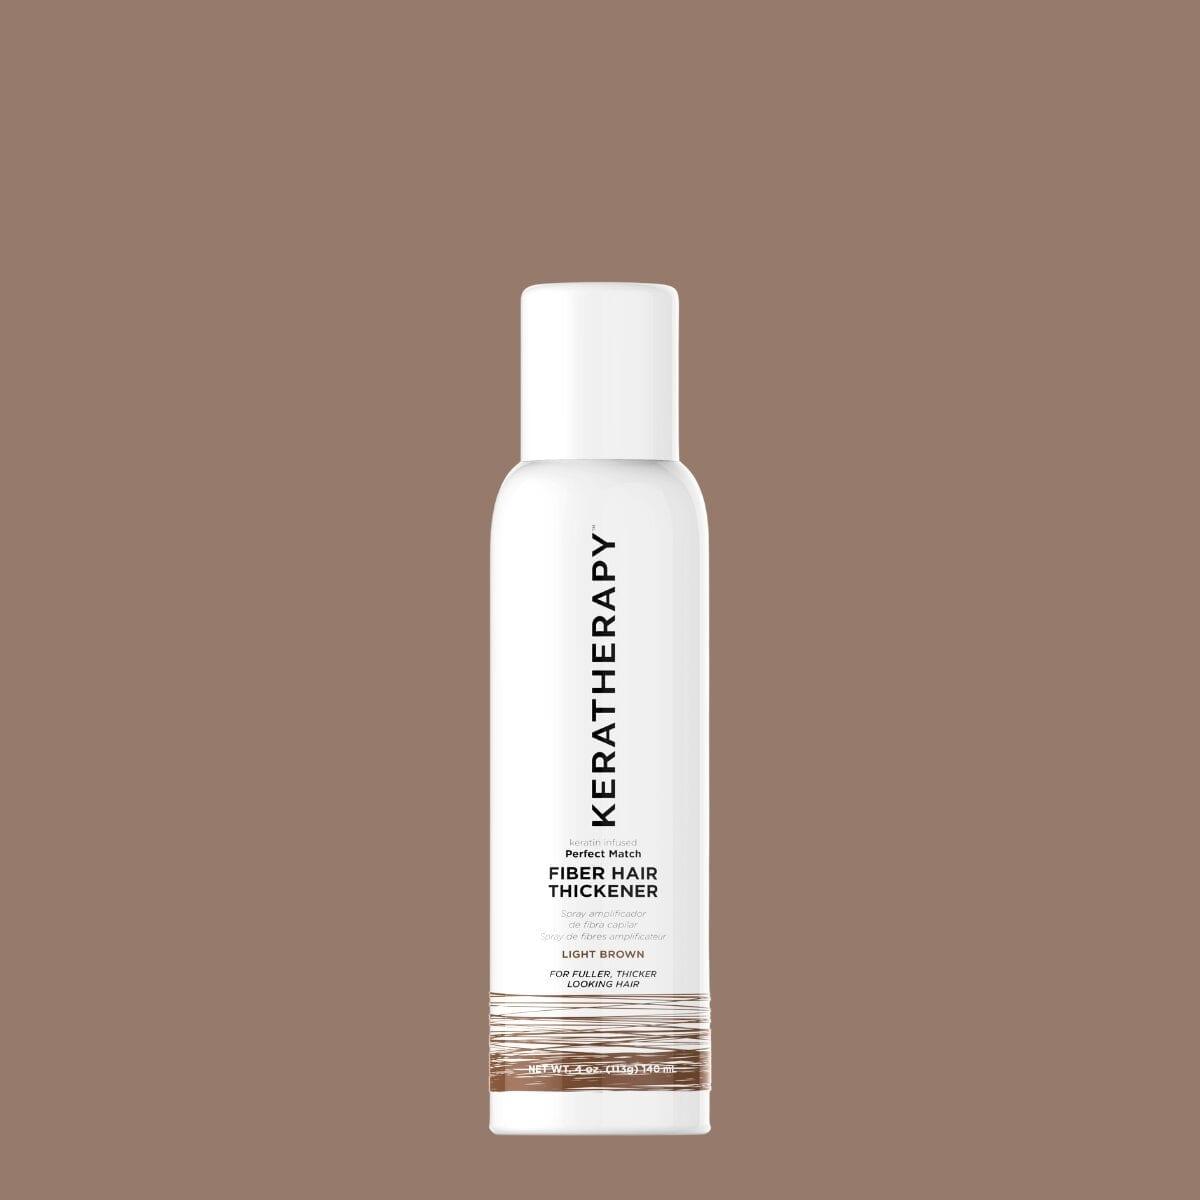 keratherapy fiber hair thickener light brown